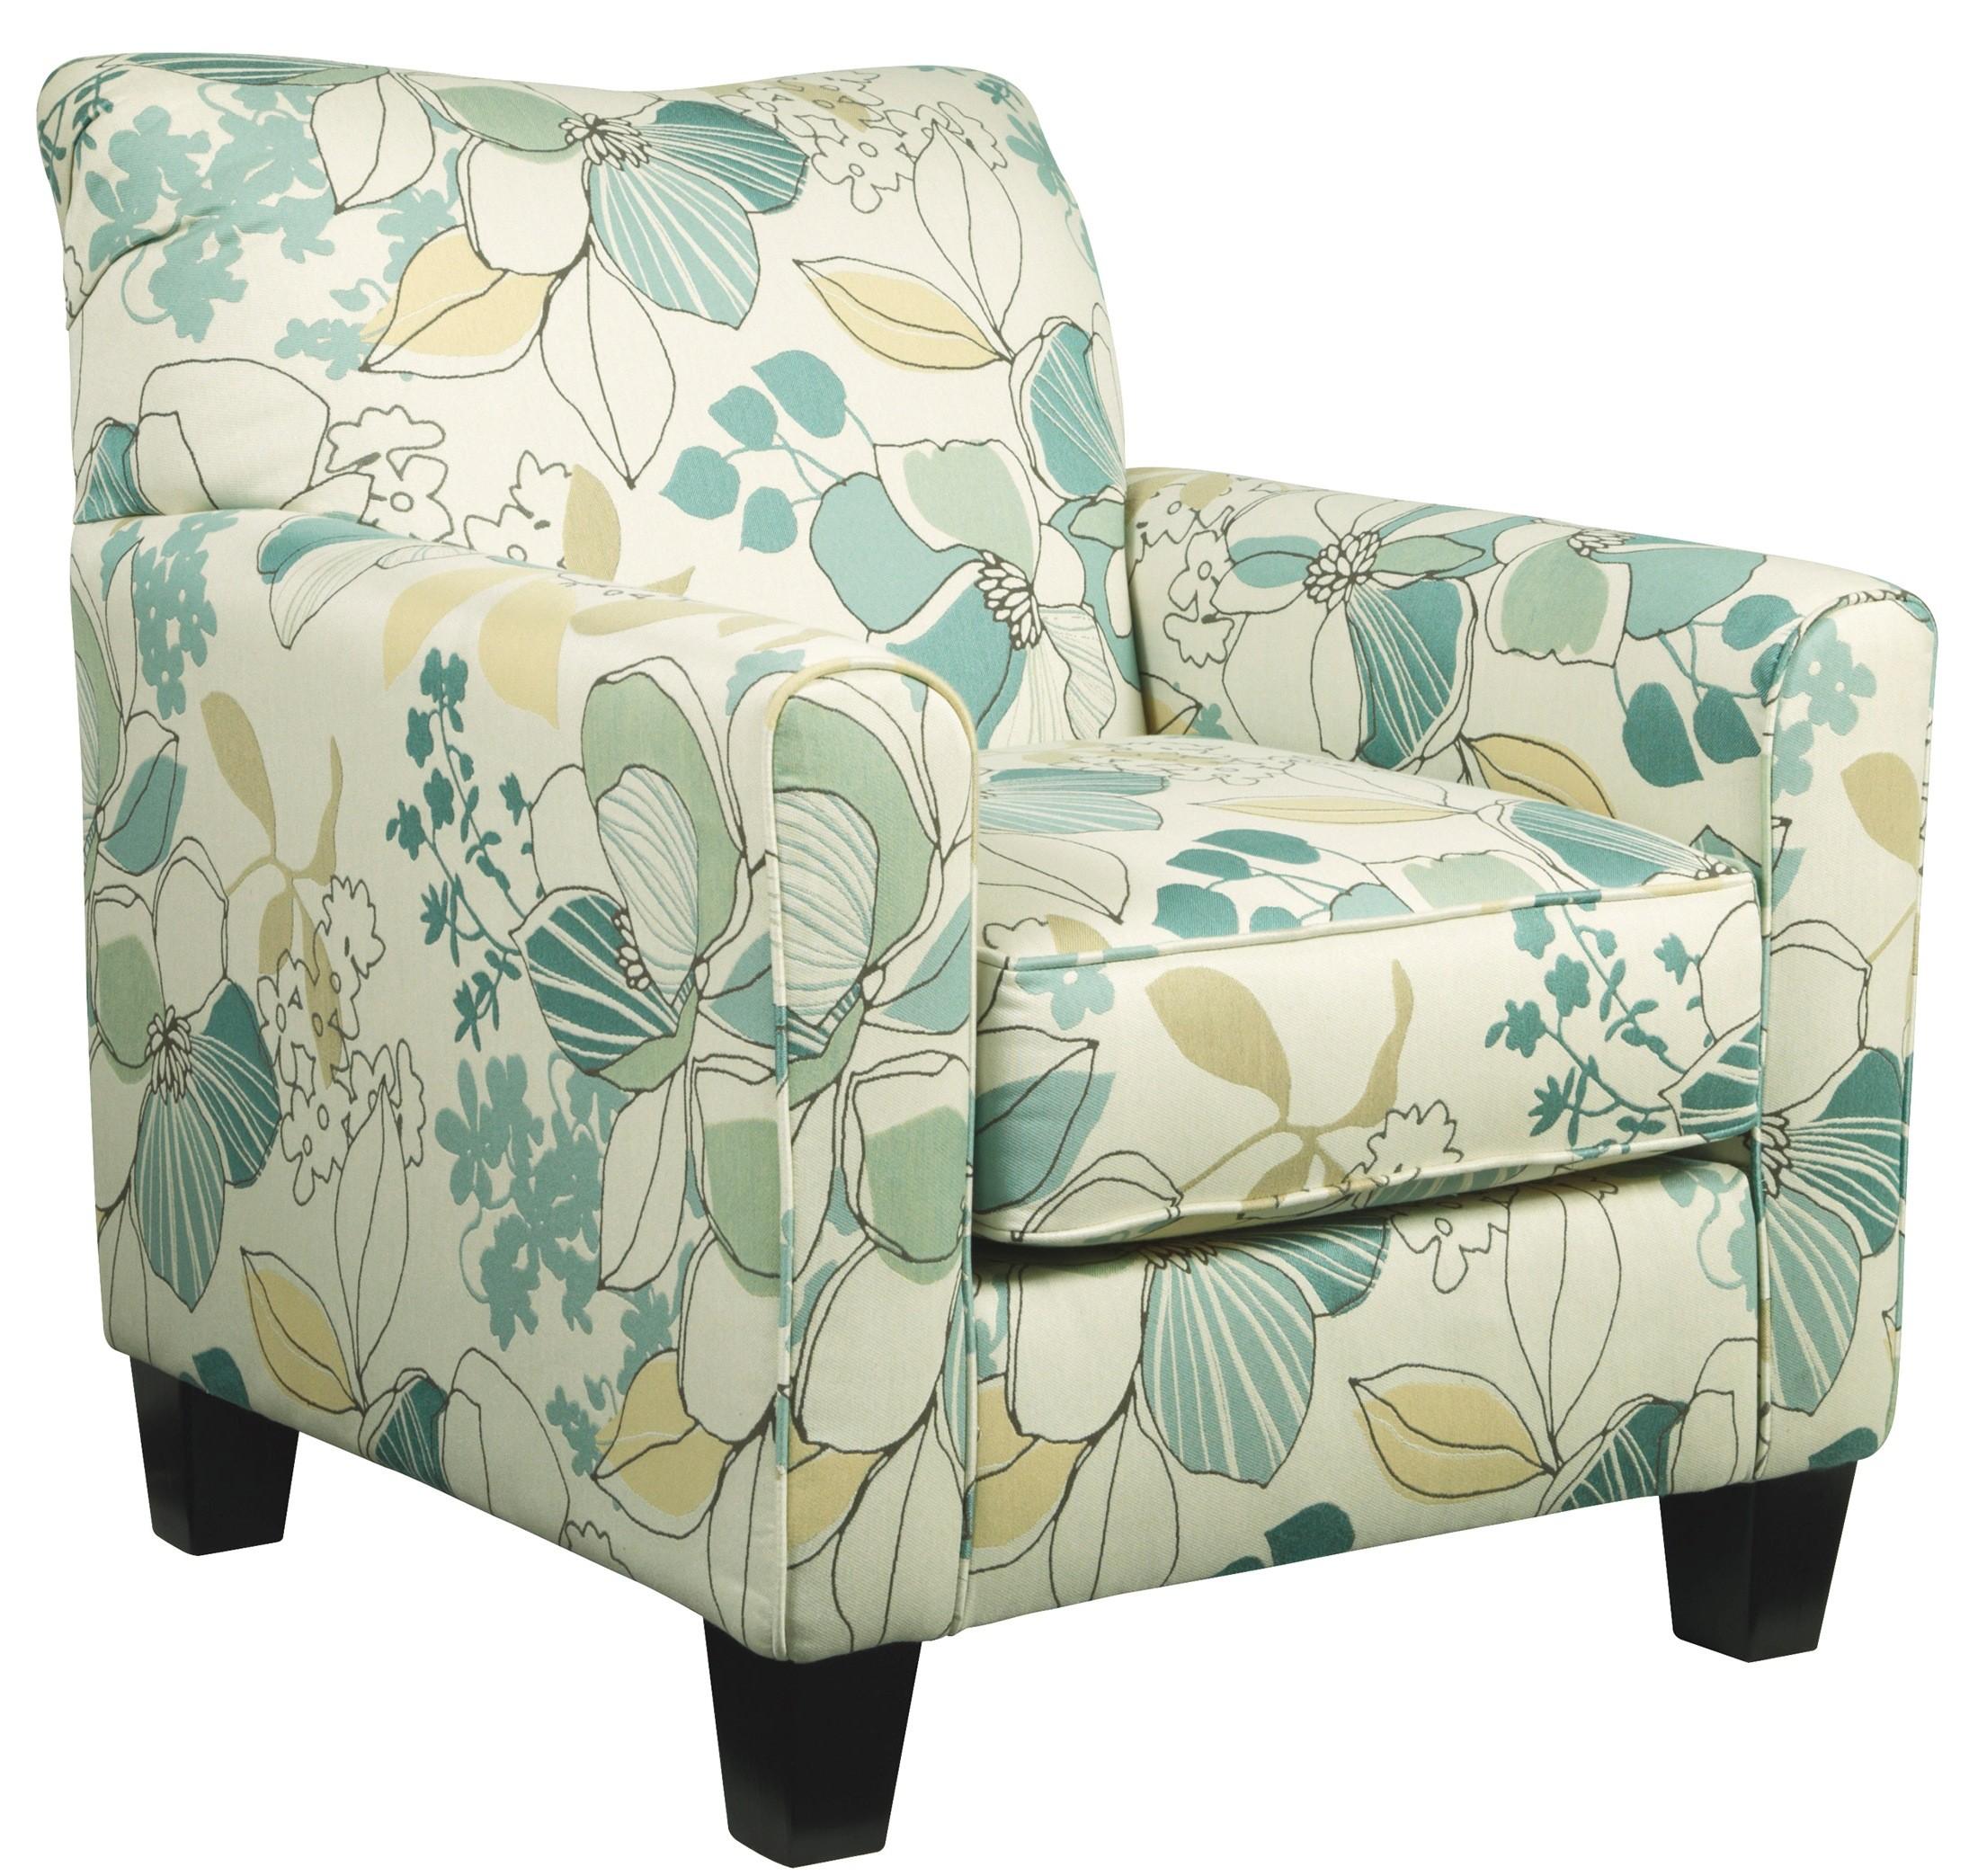 daystar living room set from ashley (28200-38-35) | coleman furniture